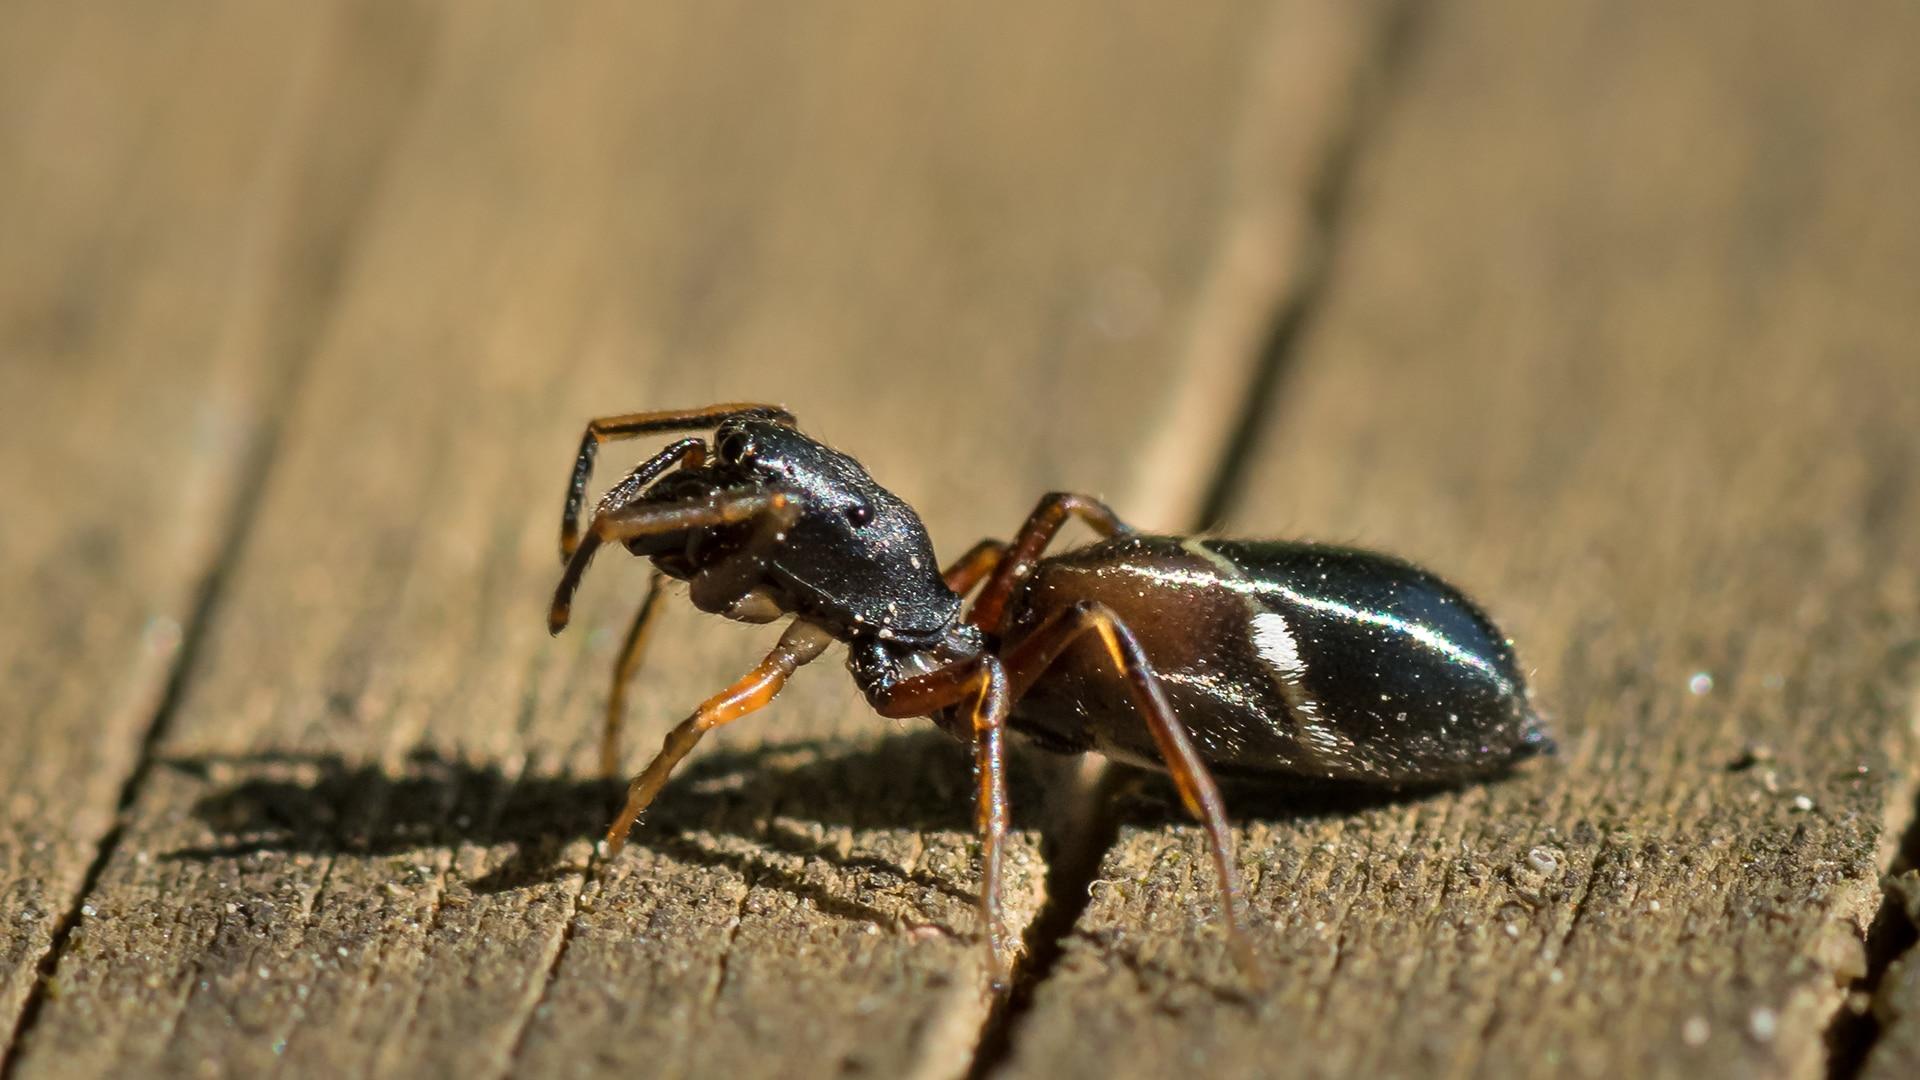 Jumping spider or myrmarachne formicaria